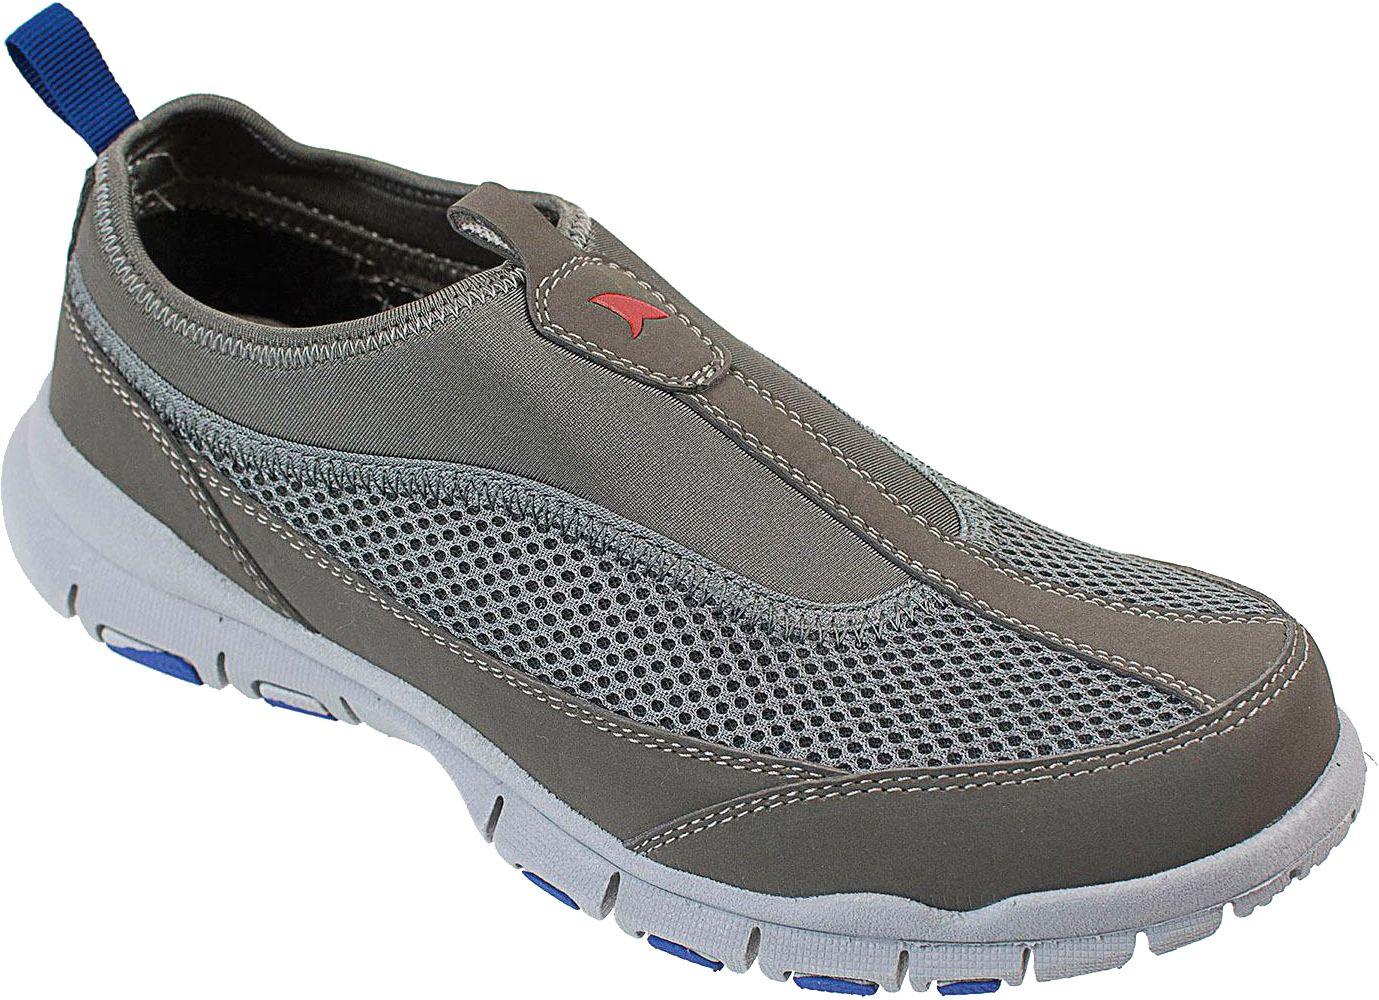 Men's Water Shoes | DICK'S Sporting Goods